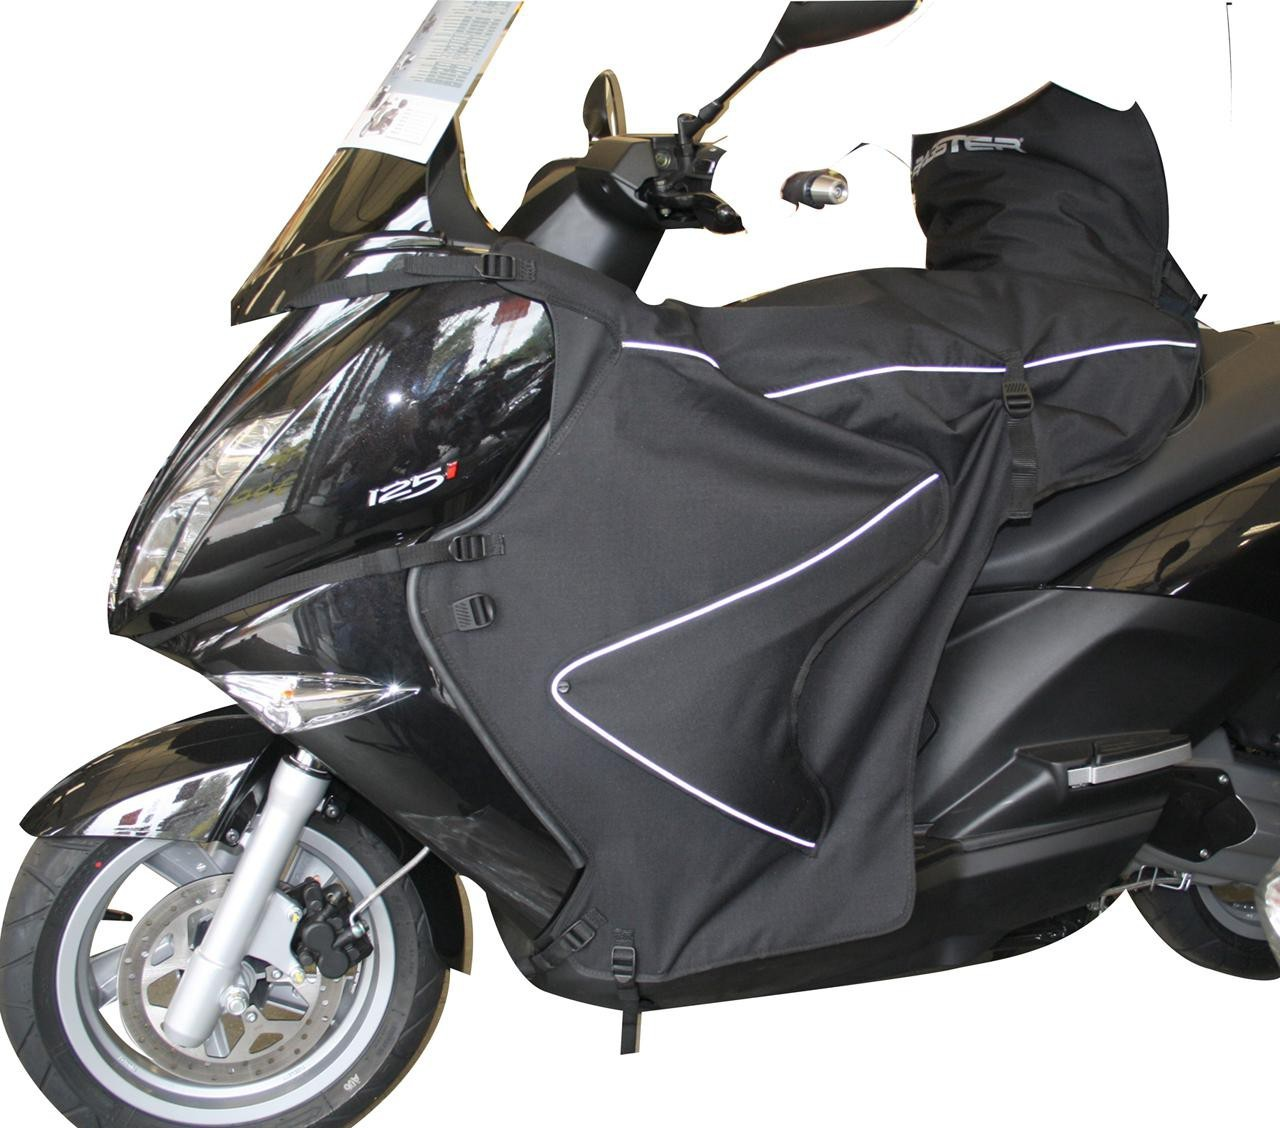 tablier scooter bagster boomerang peugeot 125 citystar pas. Black Bedroom Furniture Sets. Home Design Ideas